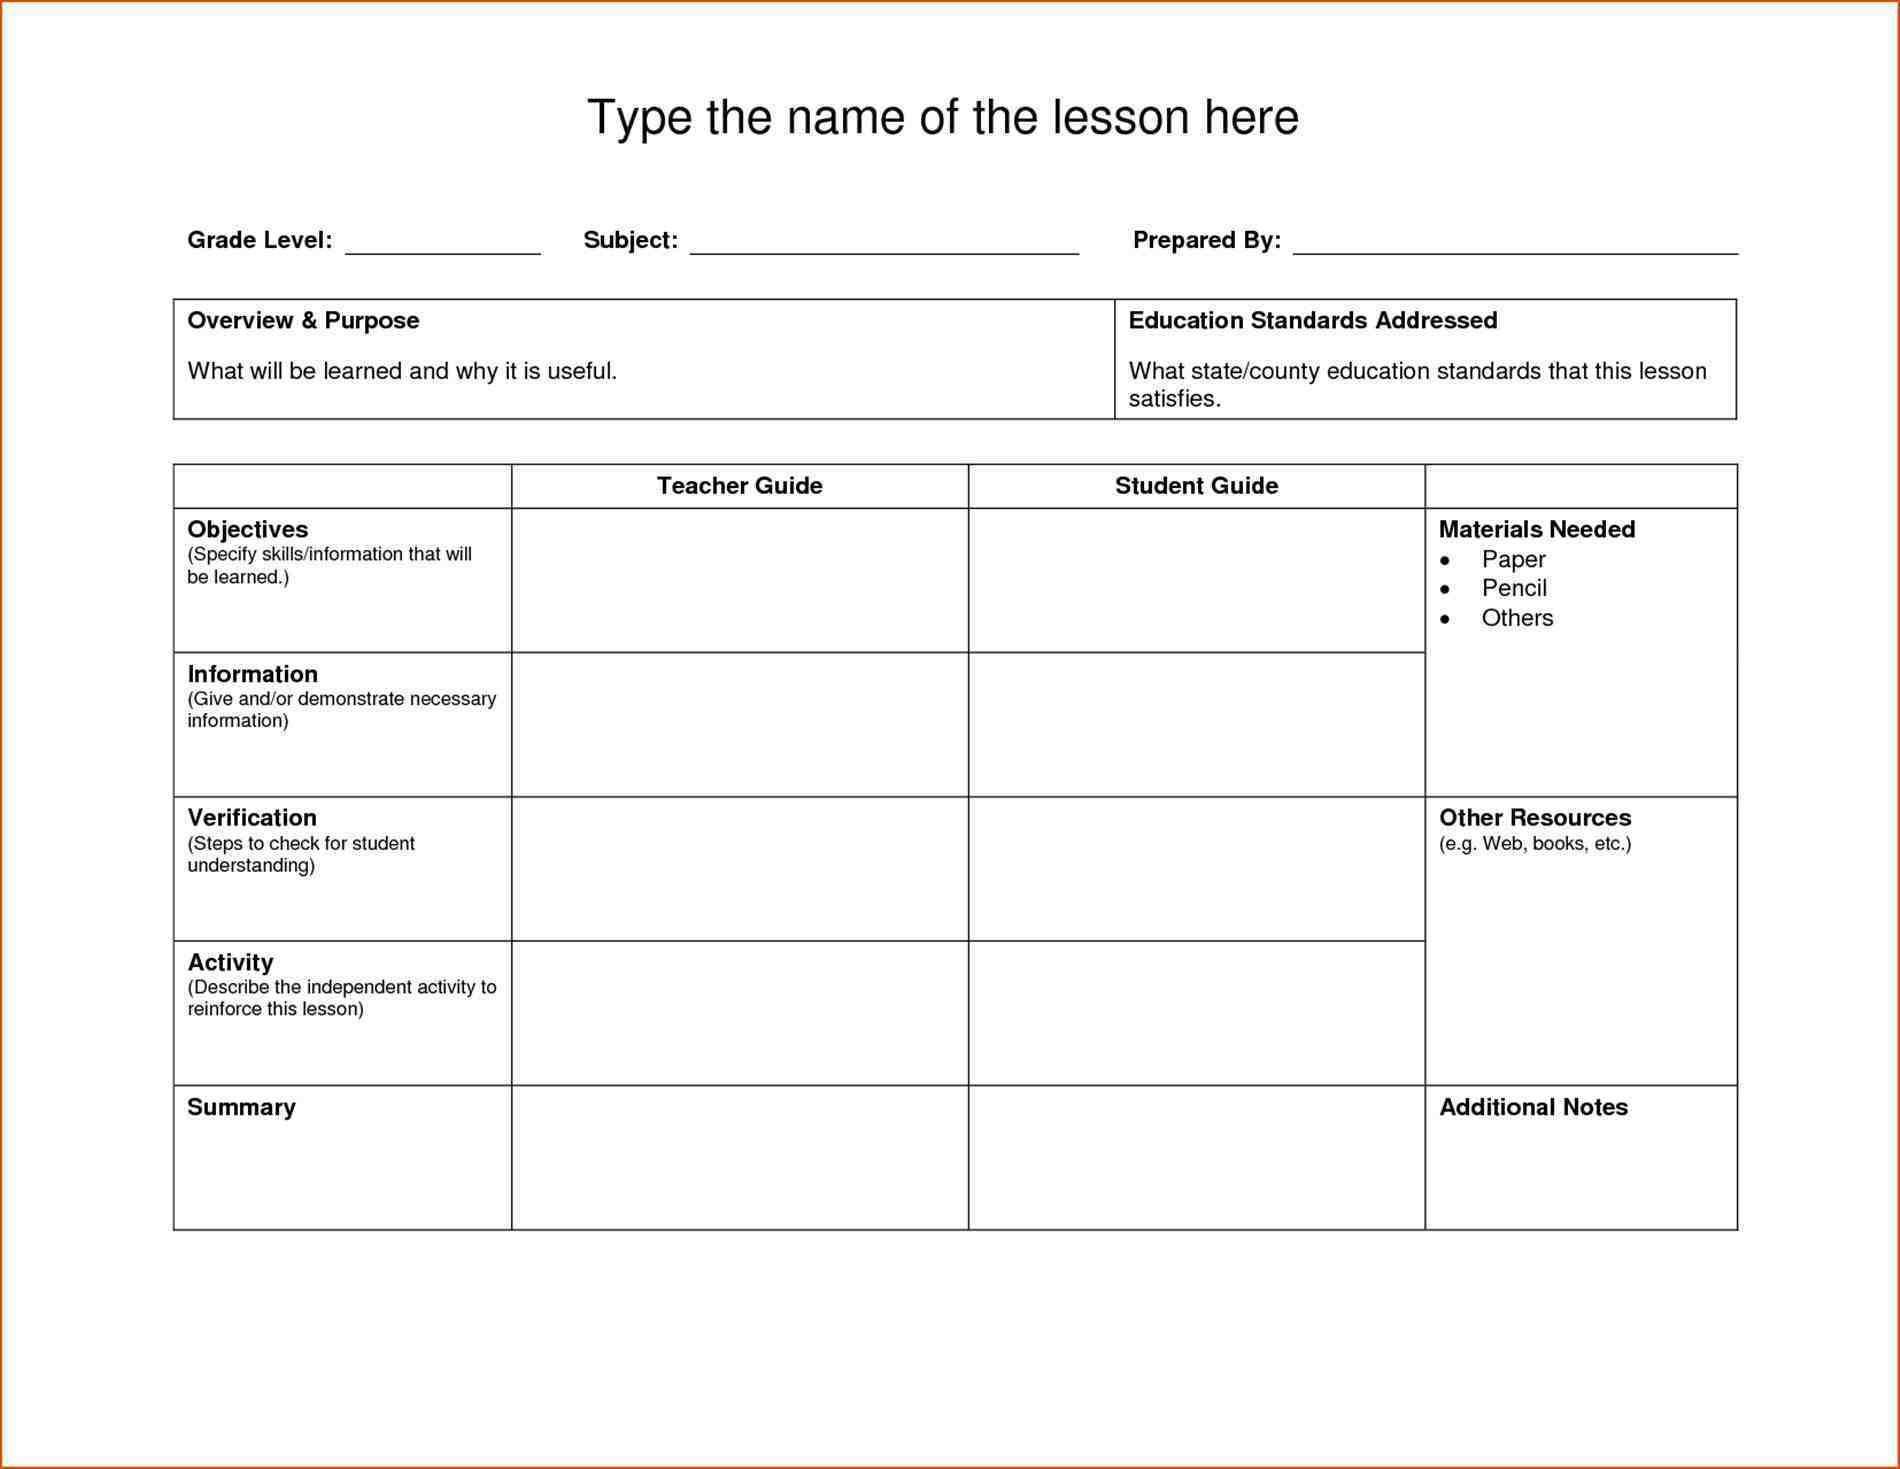 Lesson High School Lesson Plan Template Doc Plan Template Doc Latter Day Photos U Blank Lesson Plan Template Lesson Plan Templates Weekly Lesson Plan Template Simple lesson plan template doc